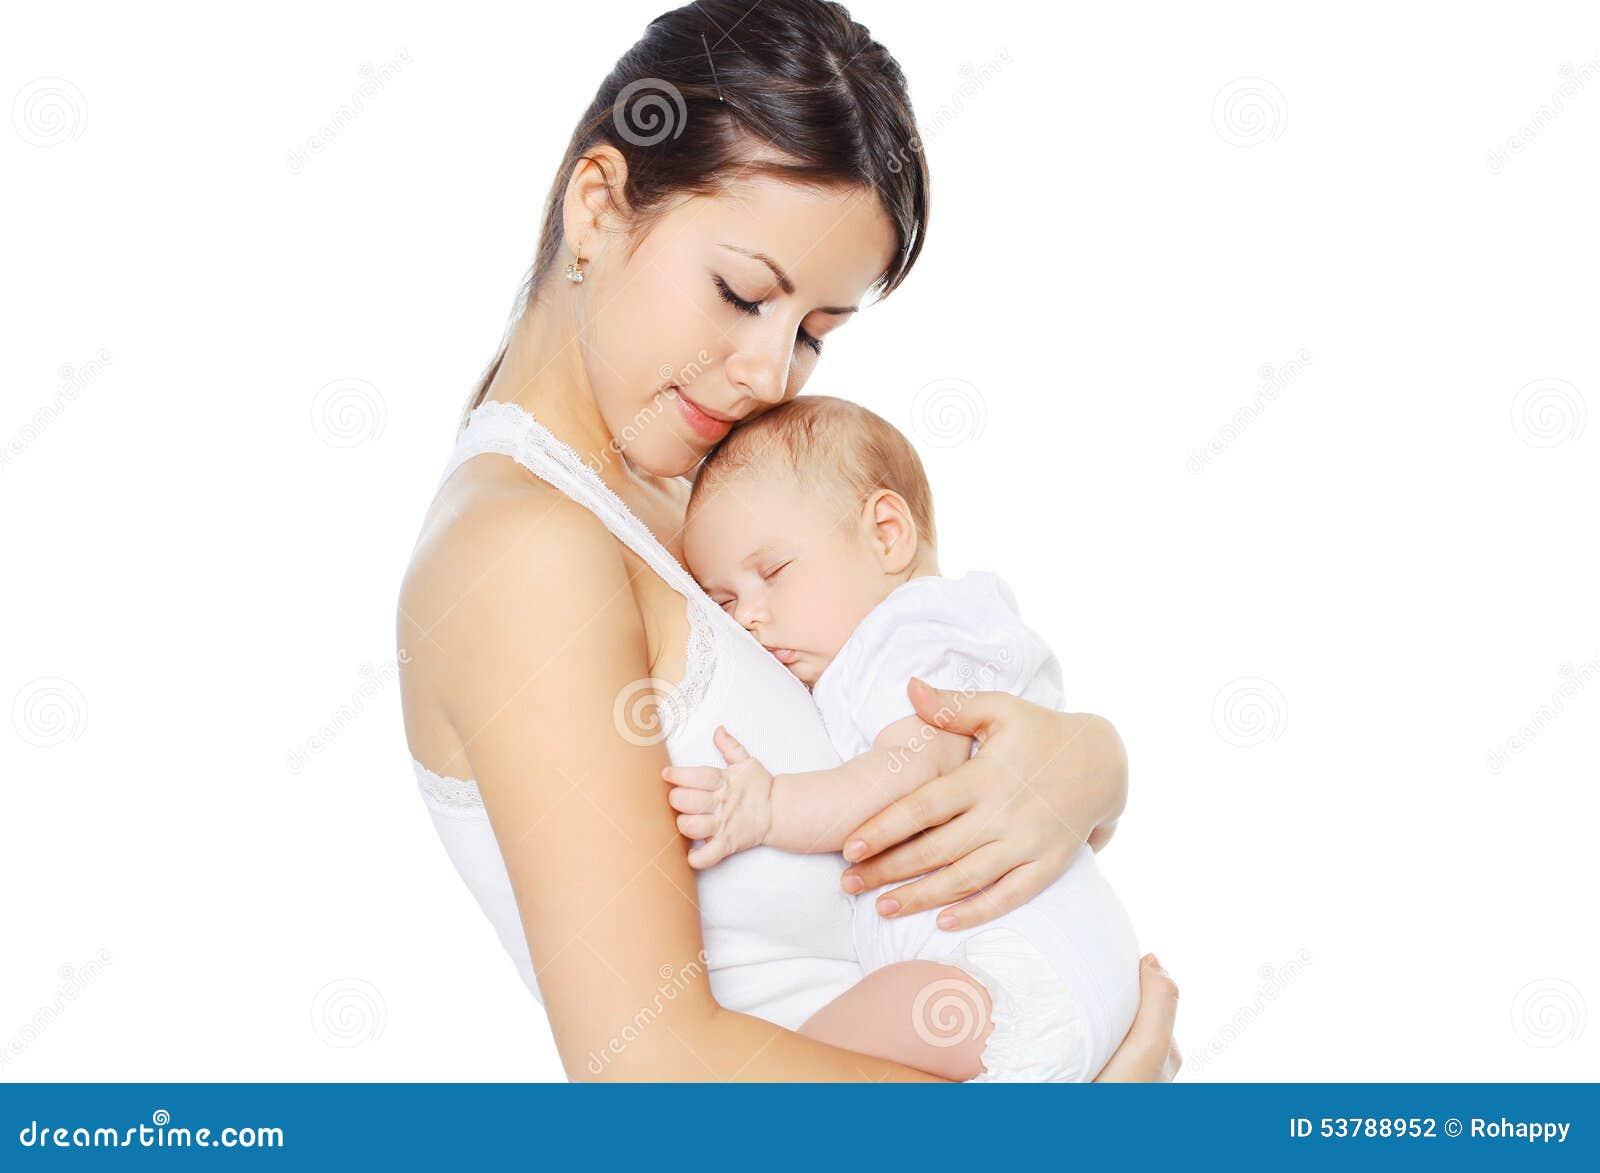 88112745c9e Sweet Baby Sleeping On Hands Mother Stock Photo - Image of adorable ...